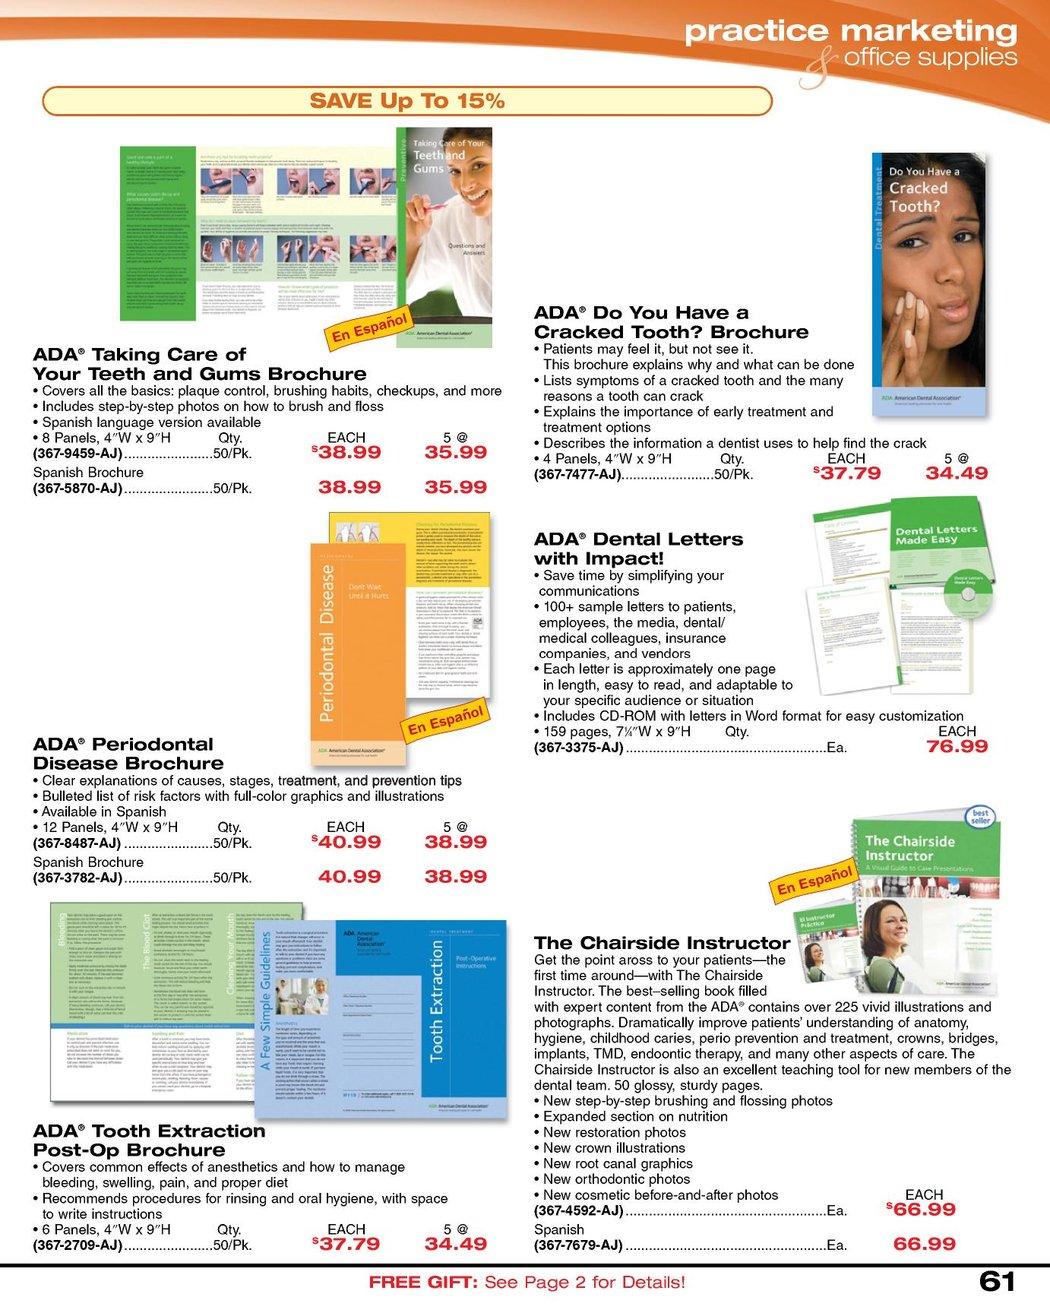 Dental Sales Flyer - May 2011